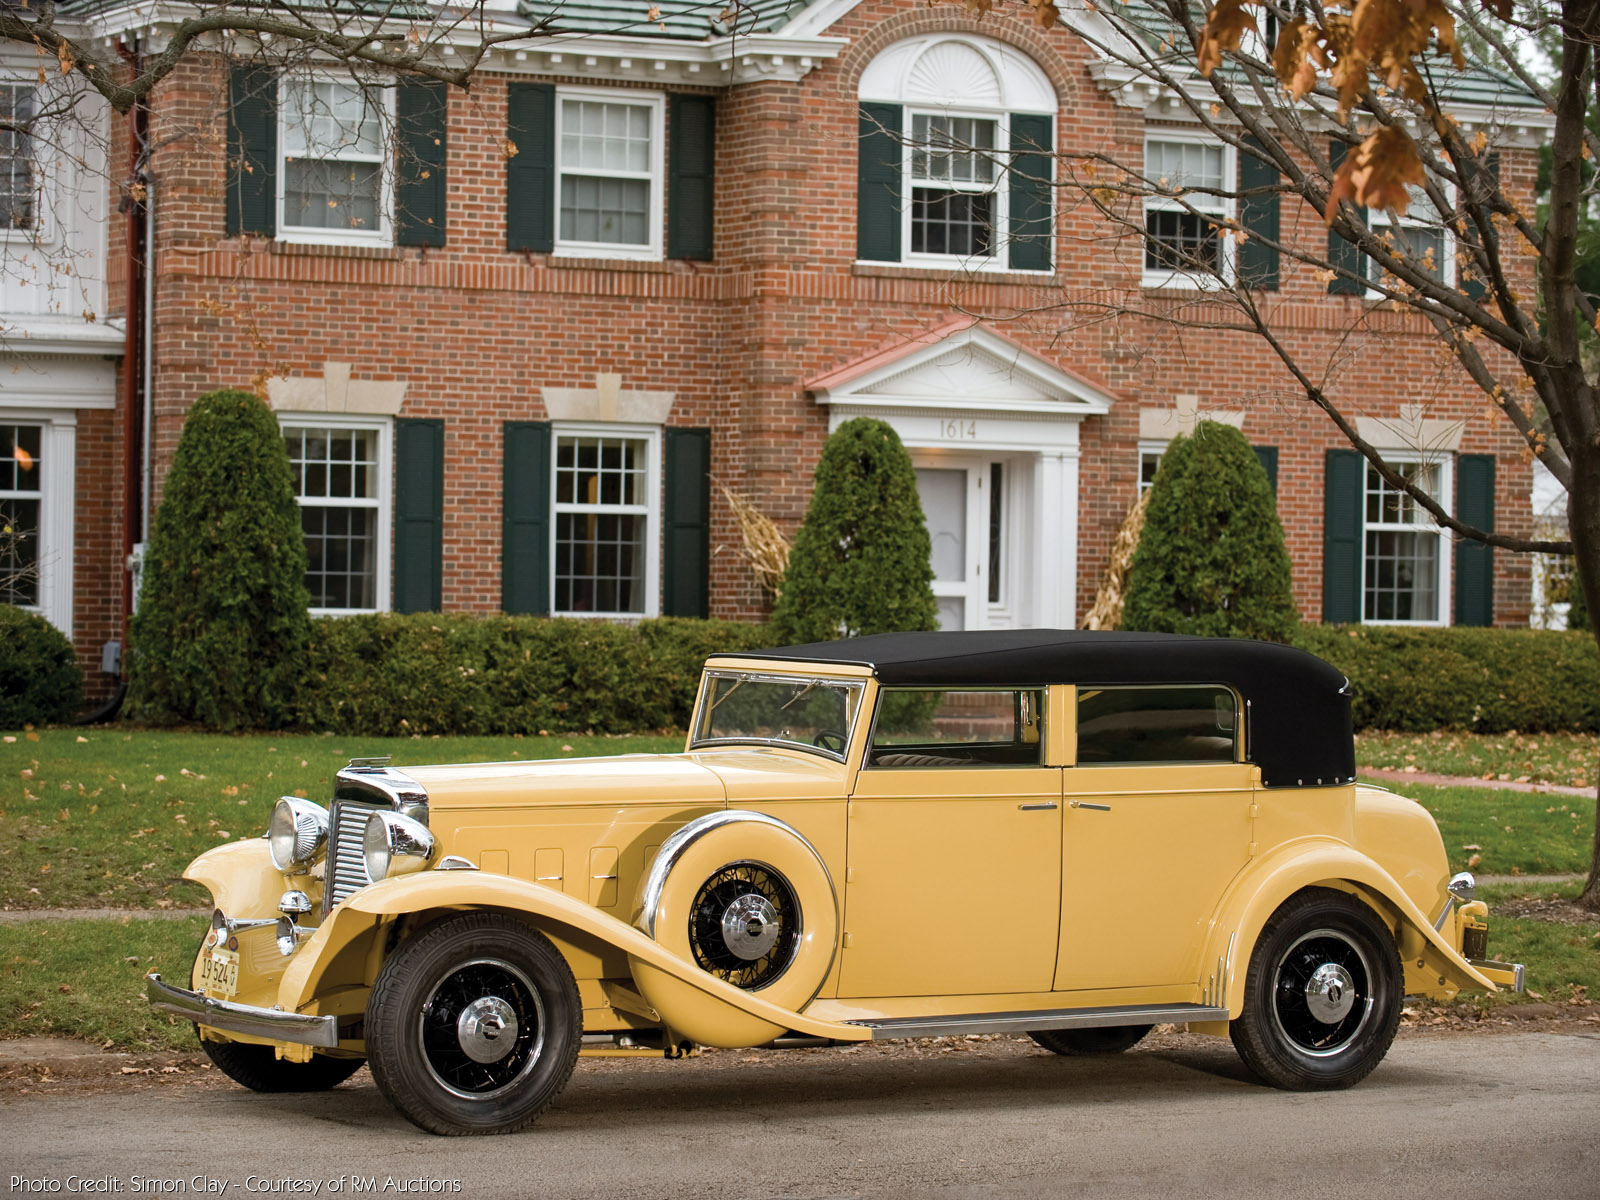 Nice Images Collection: 1931 Marmon Sixteen 4 Door Convertible Sedan By LeBaron Desktop Wallpapers